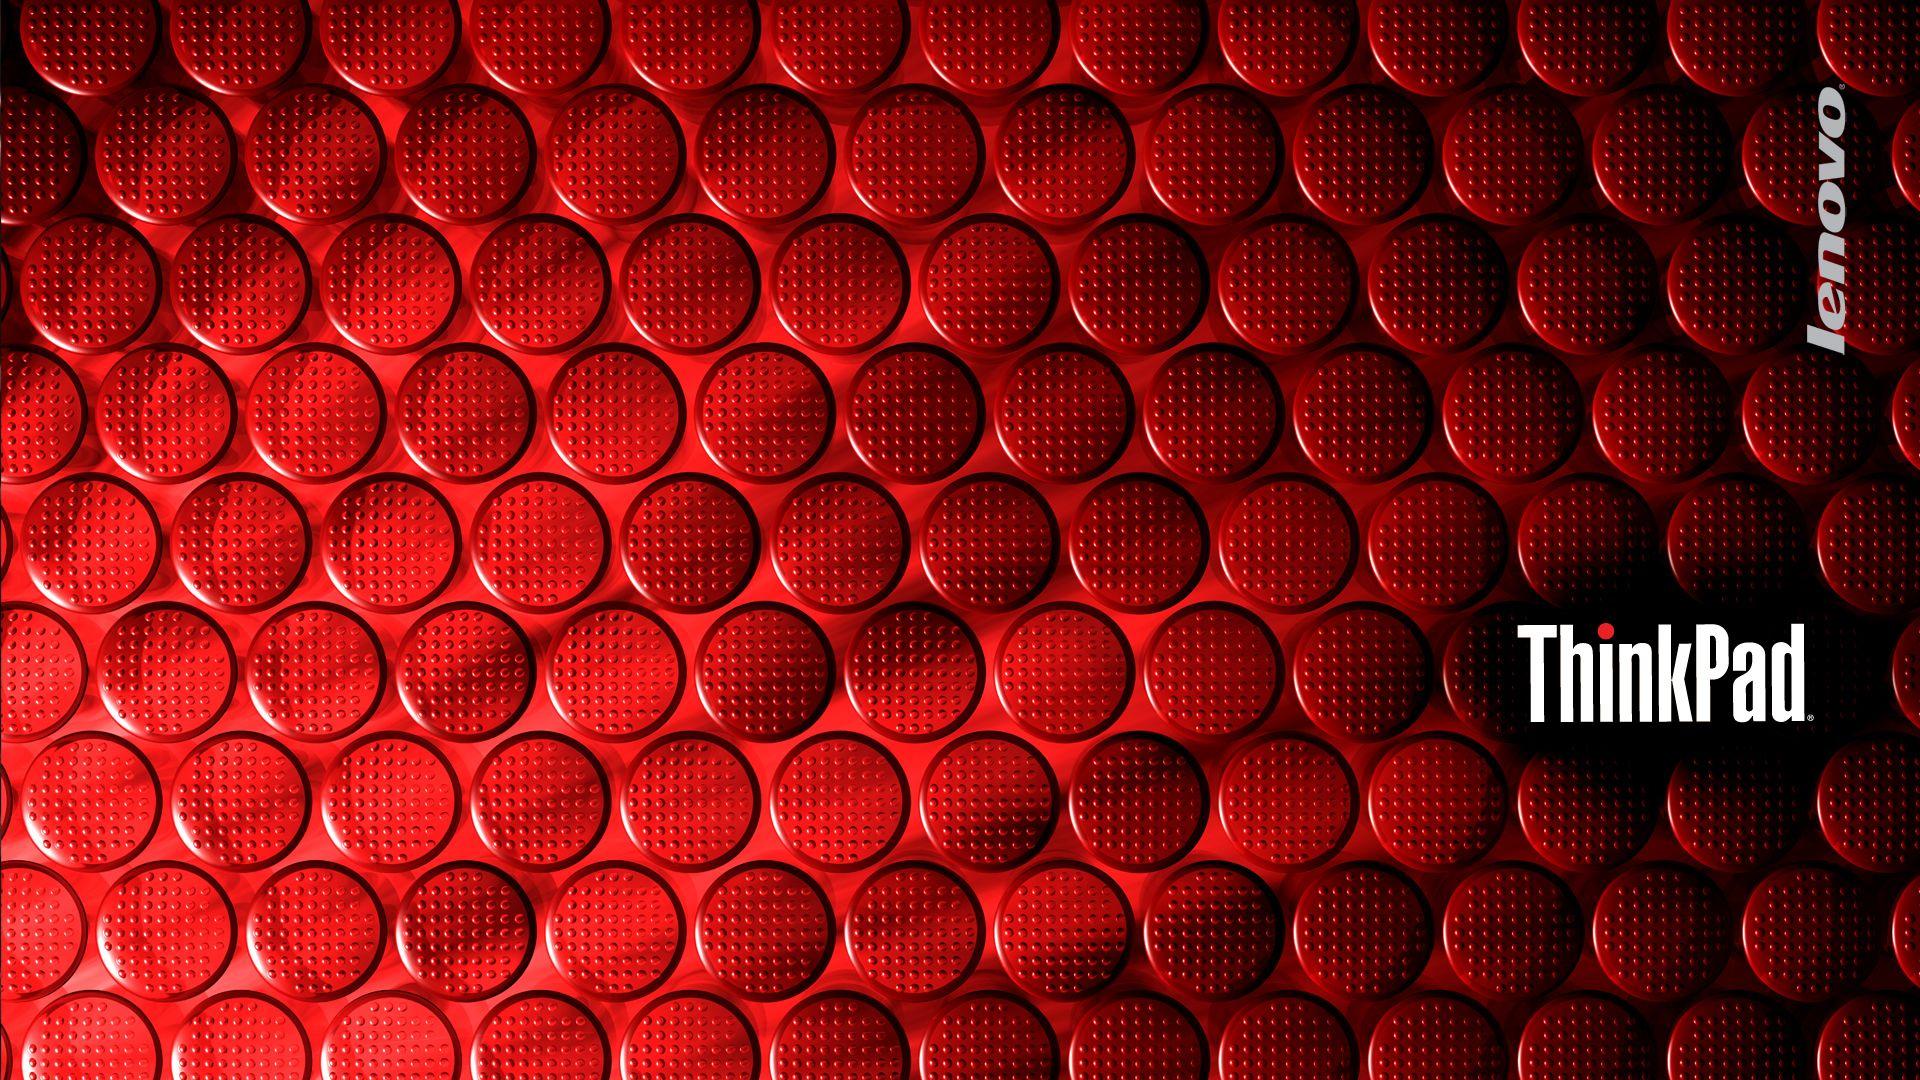 Hp Pavilion Wallpapers Wallpaper Lenovo Wallpapers Lenovo Thinkpad Tablet Wallpaper